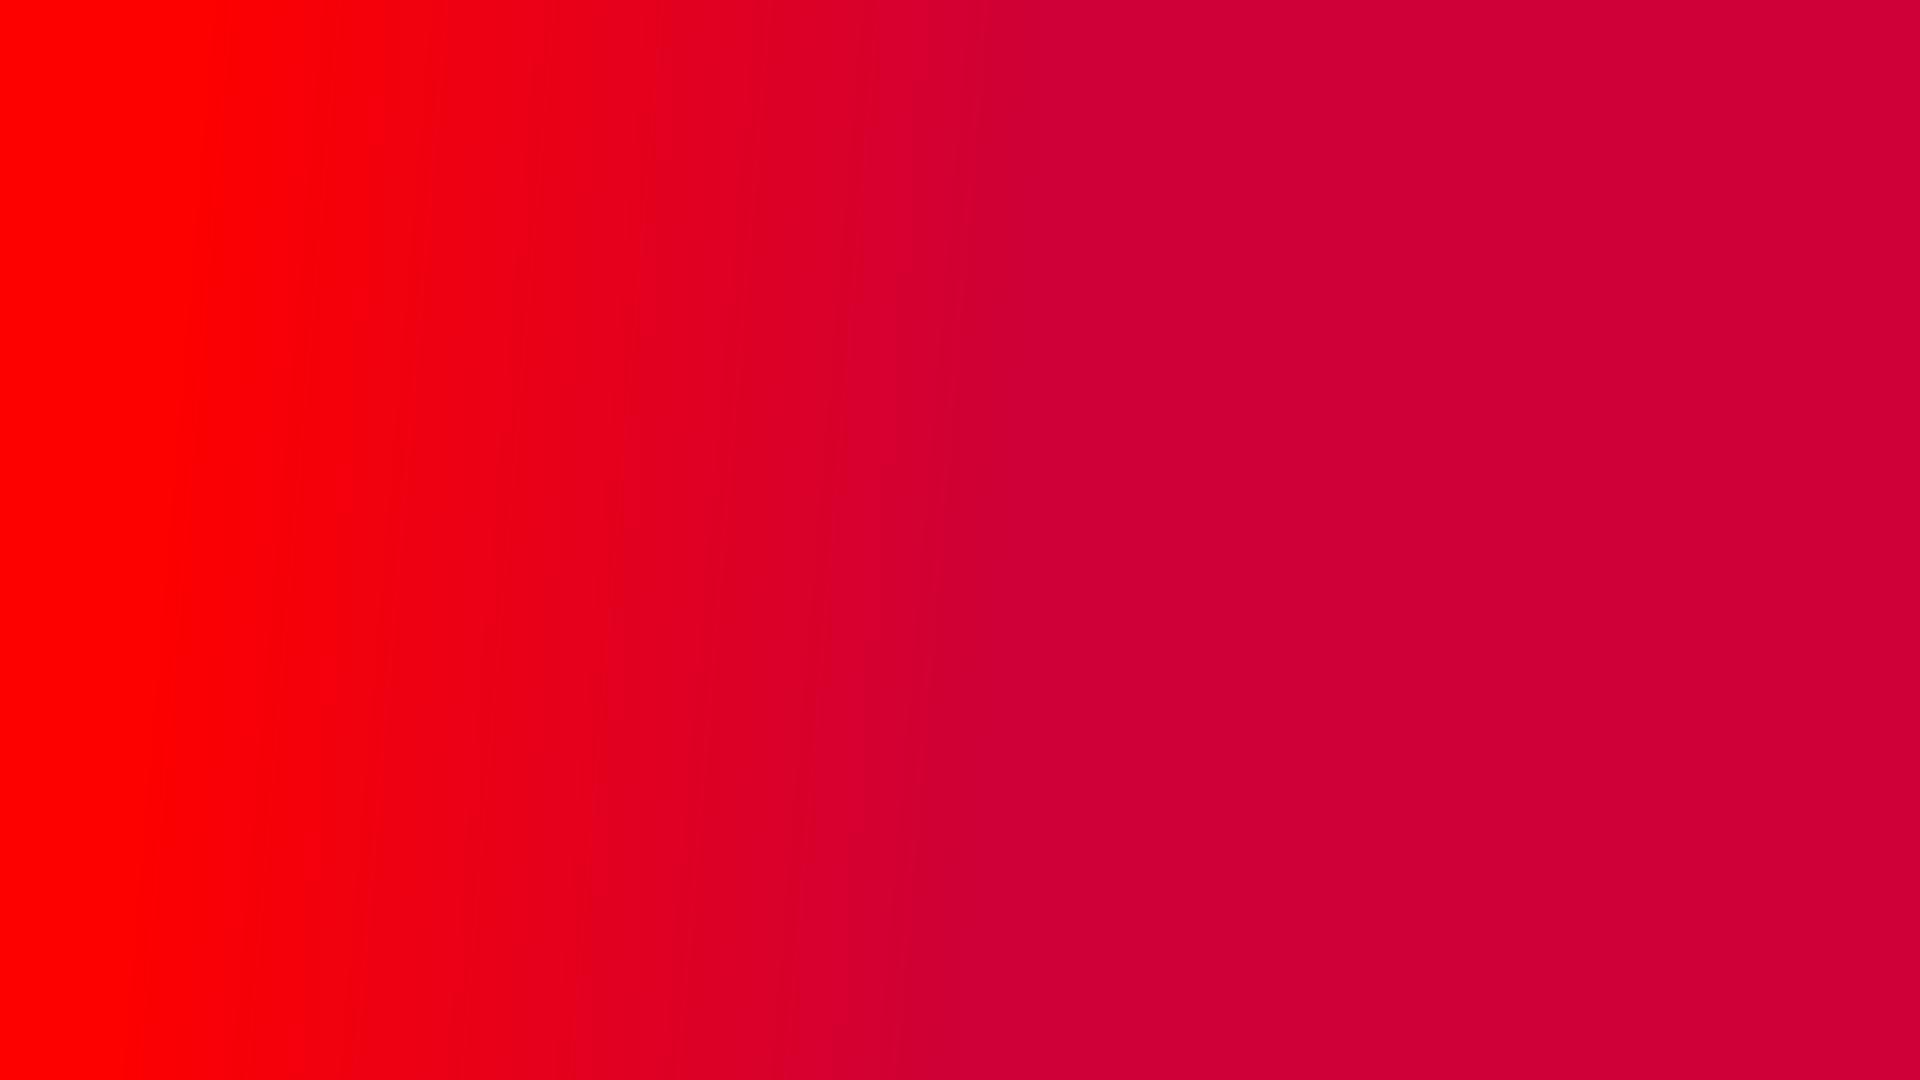 Bright Blood Red Risk Gradient